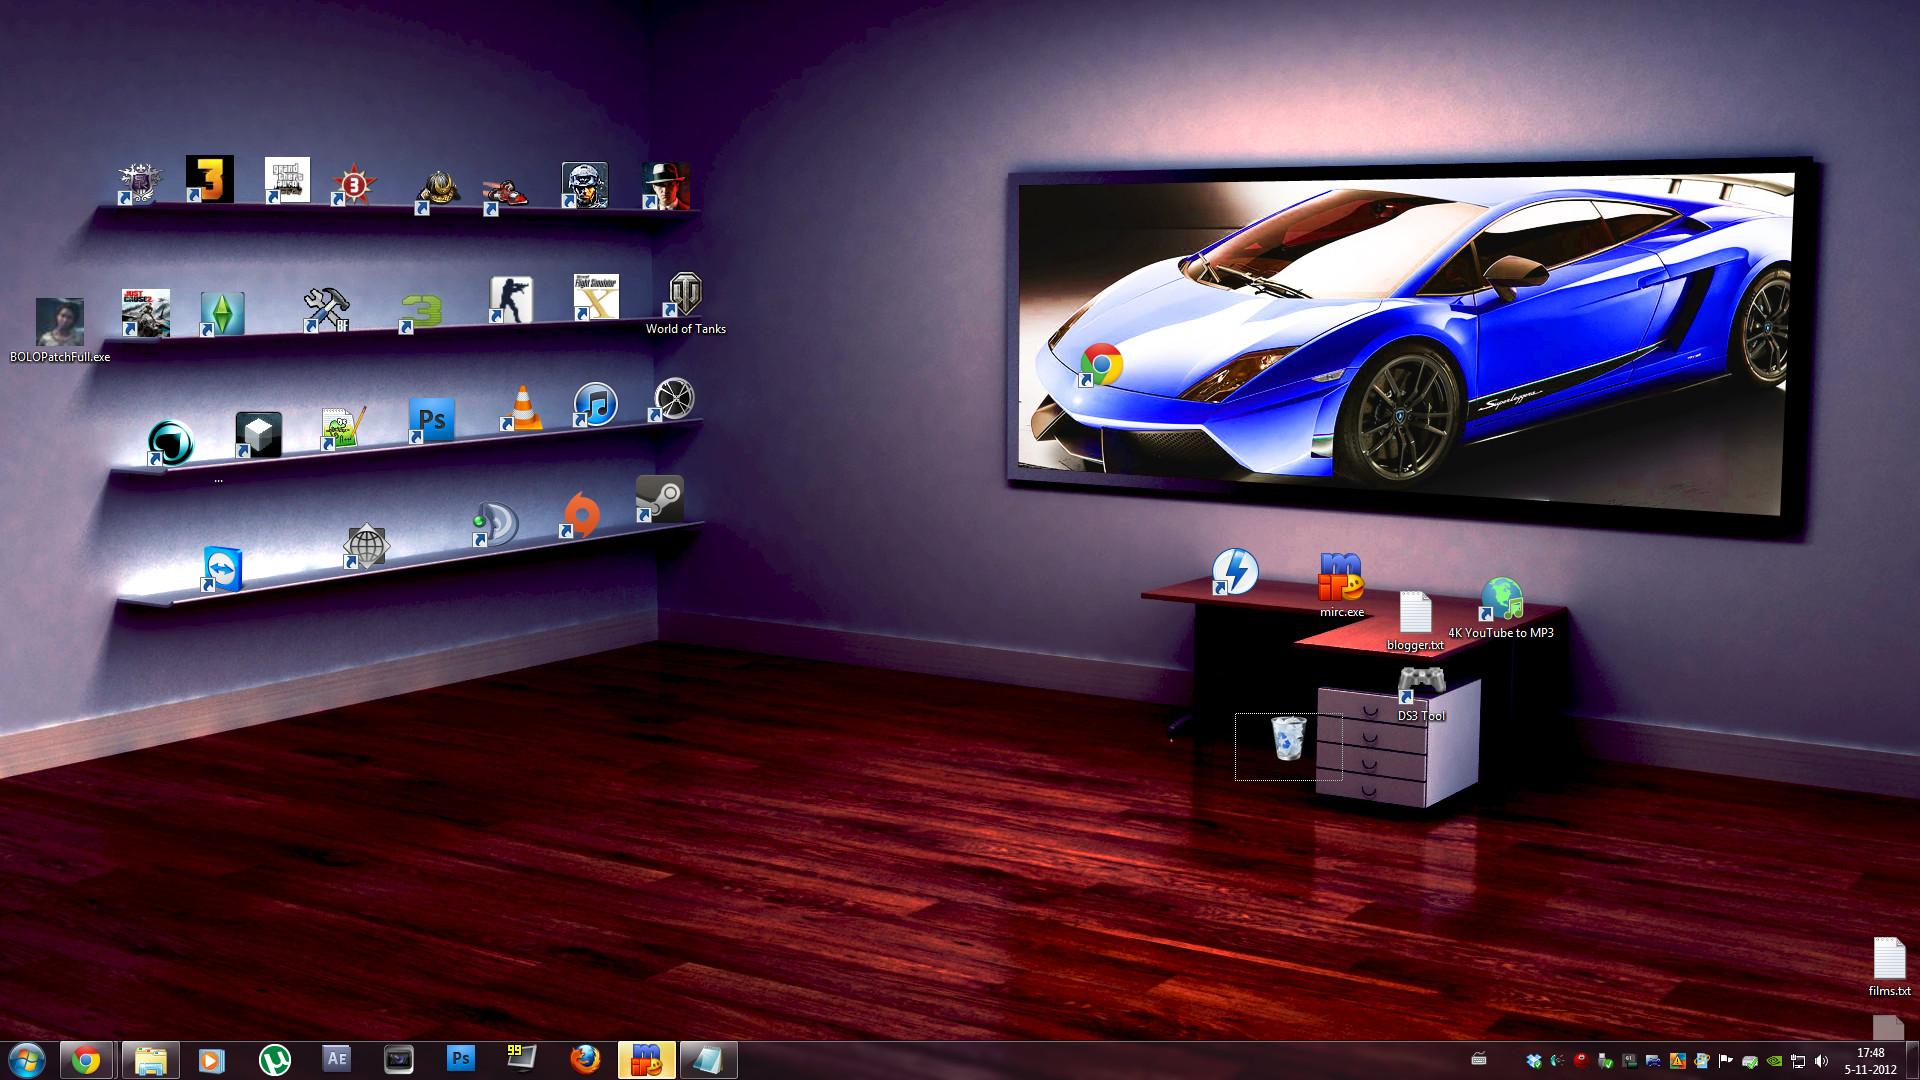 Season Wallpaper for My Desktop (59+